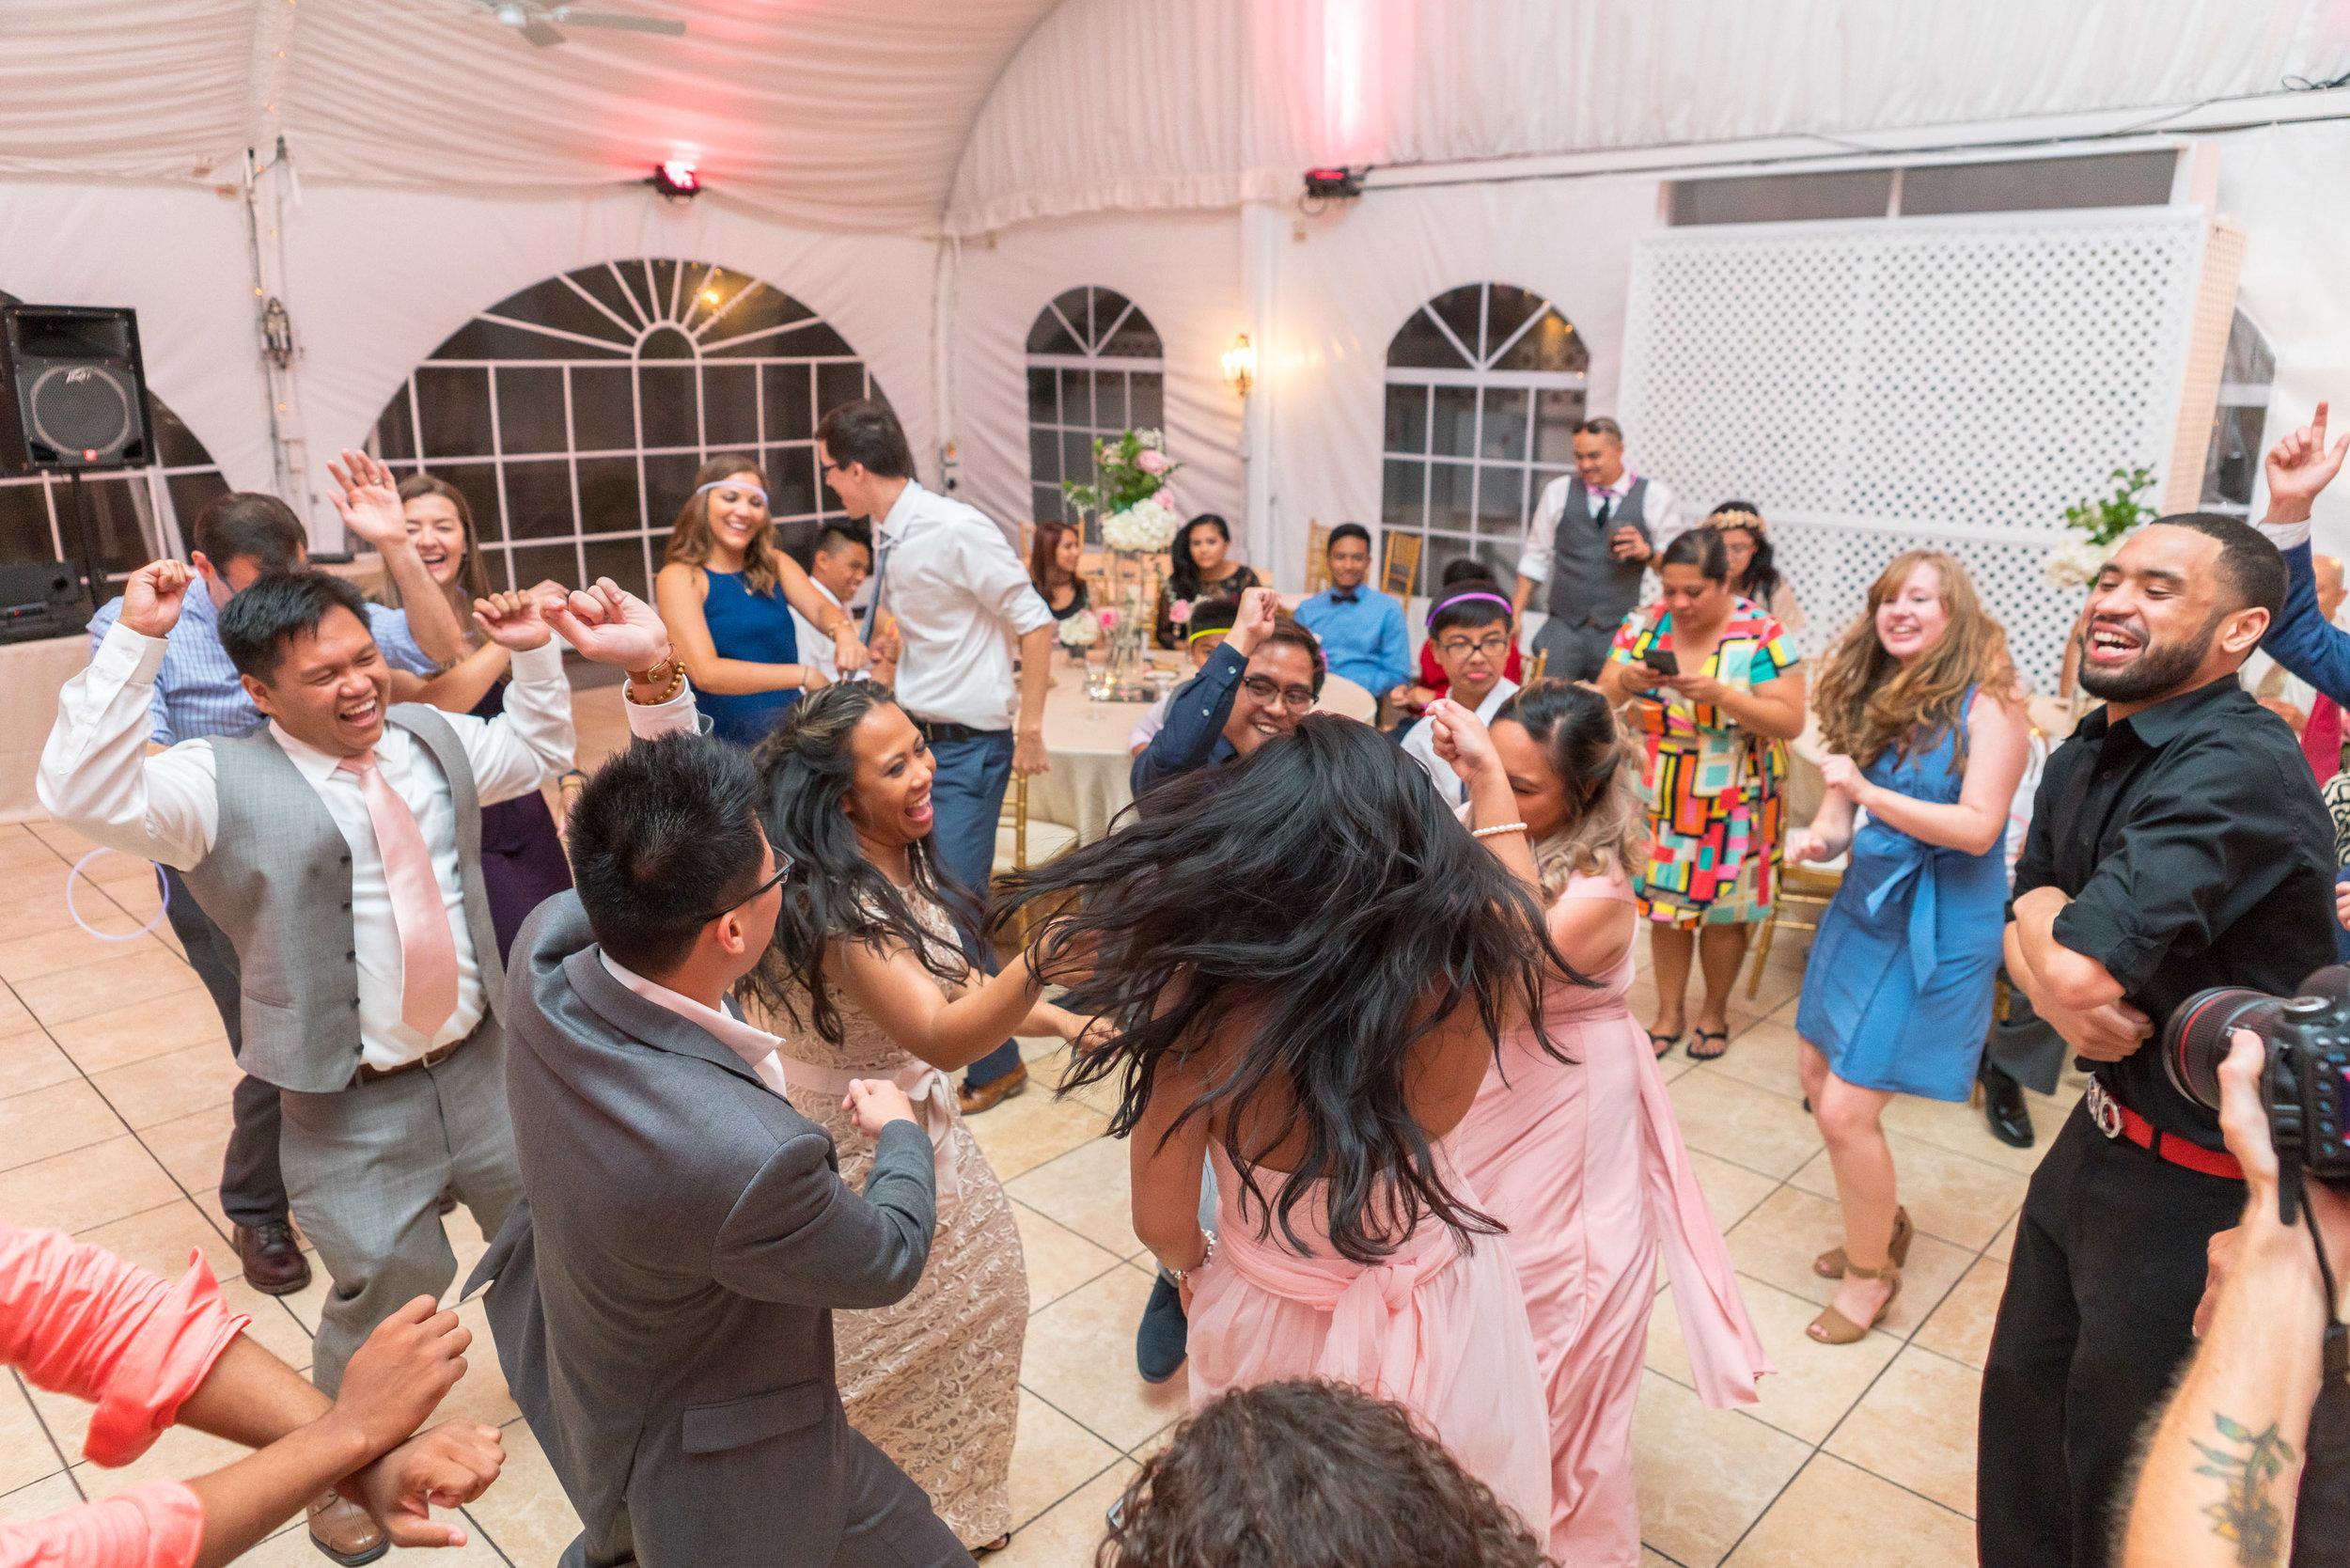 Wedding photos at The Villa in maryland